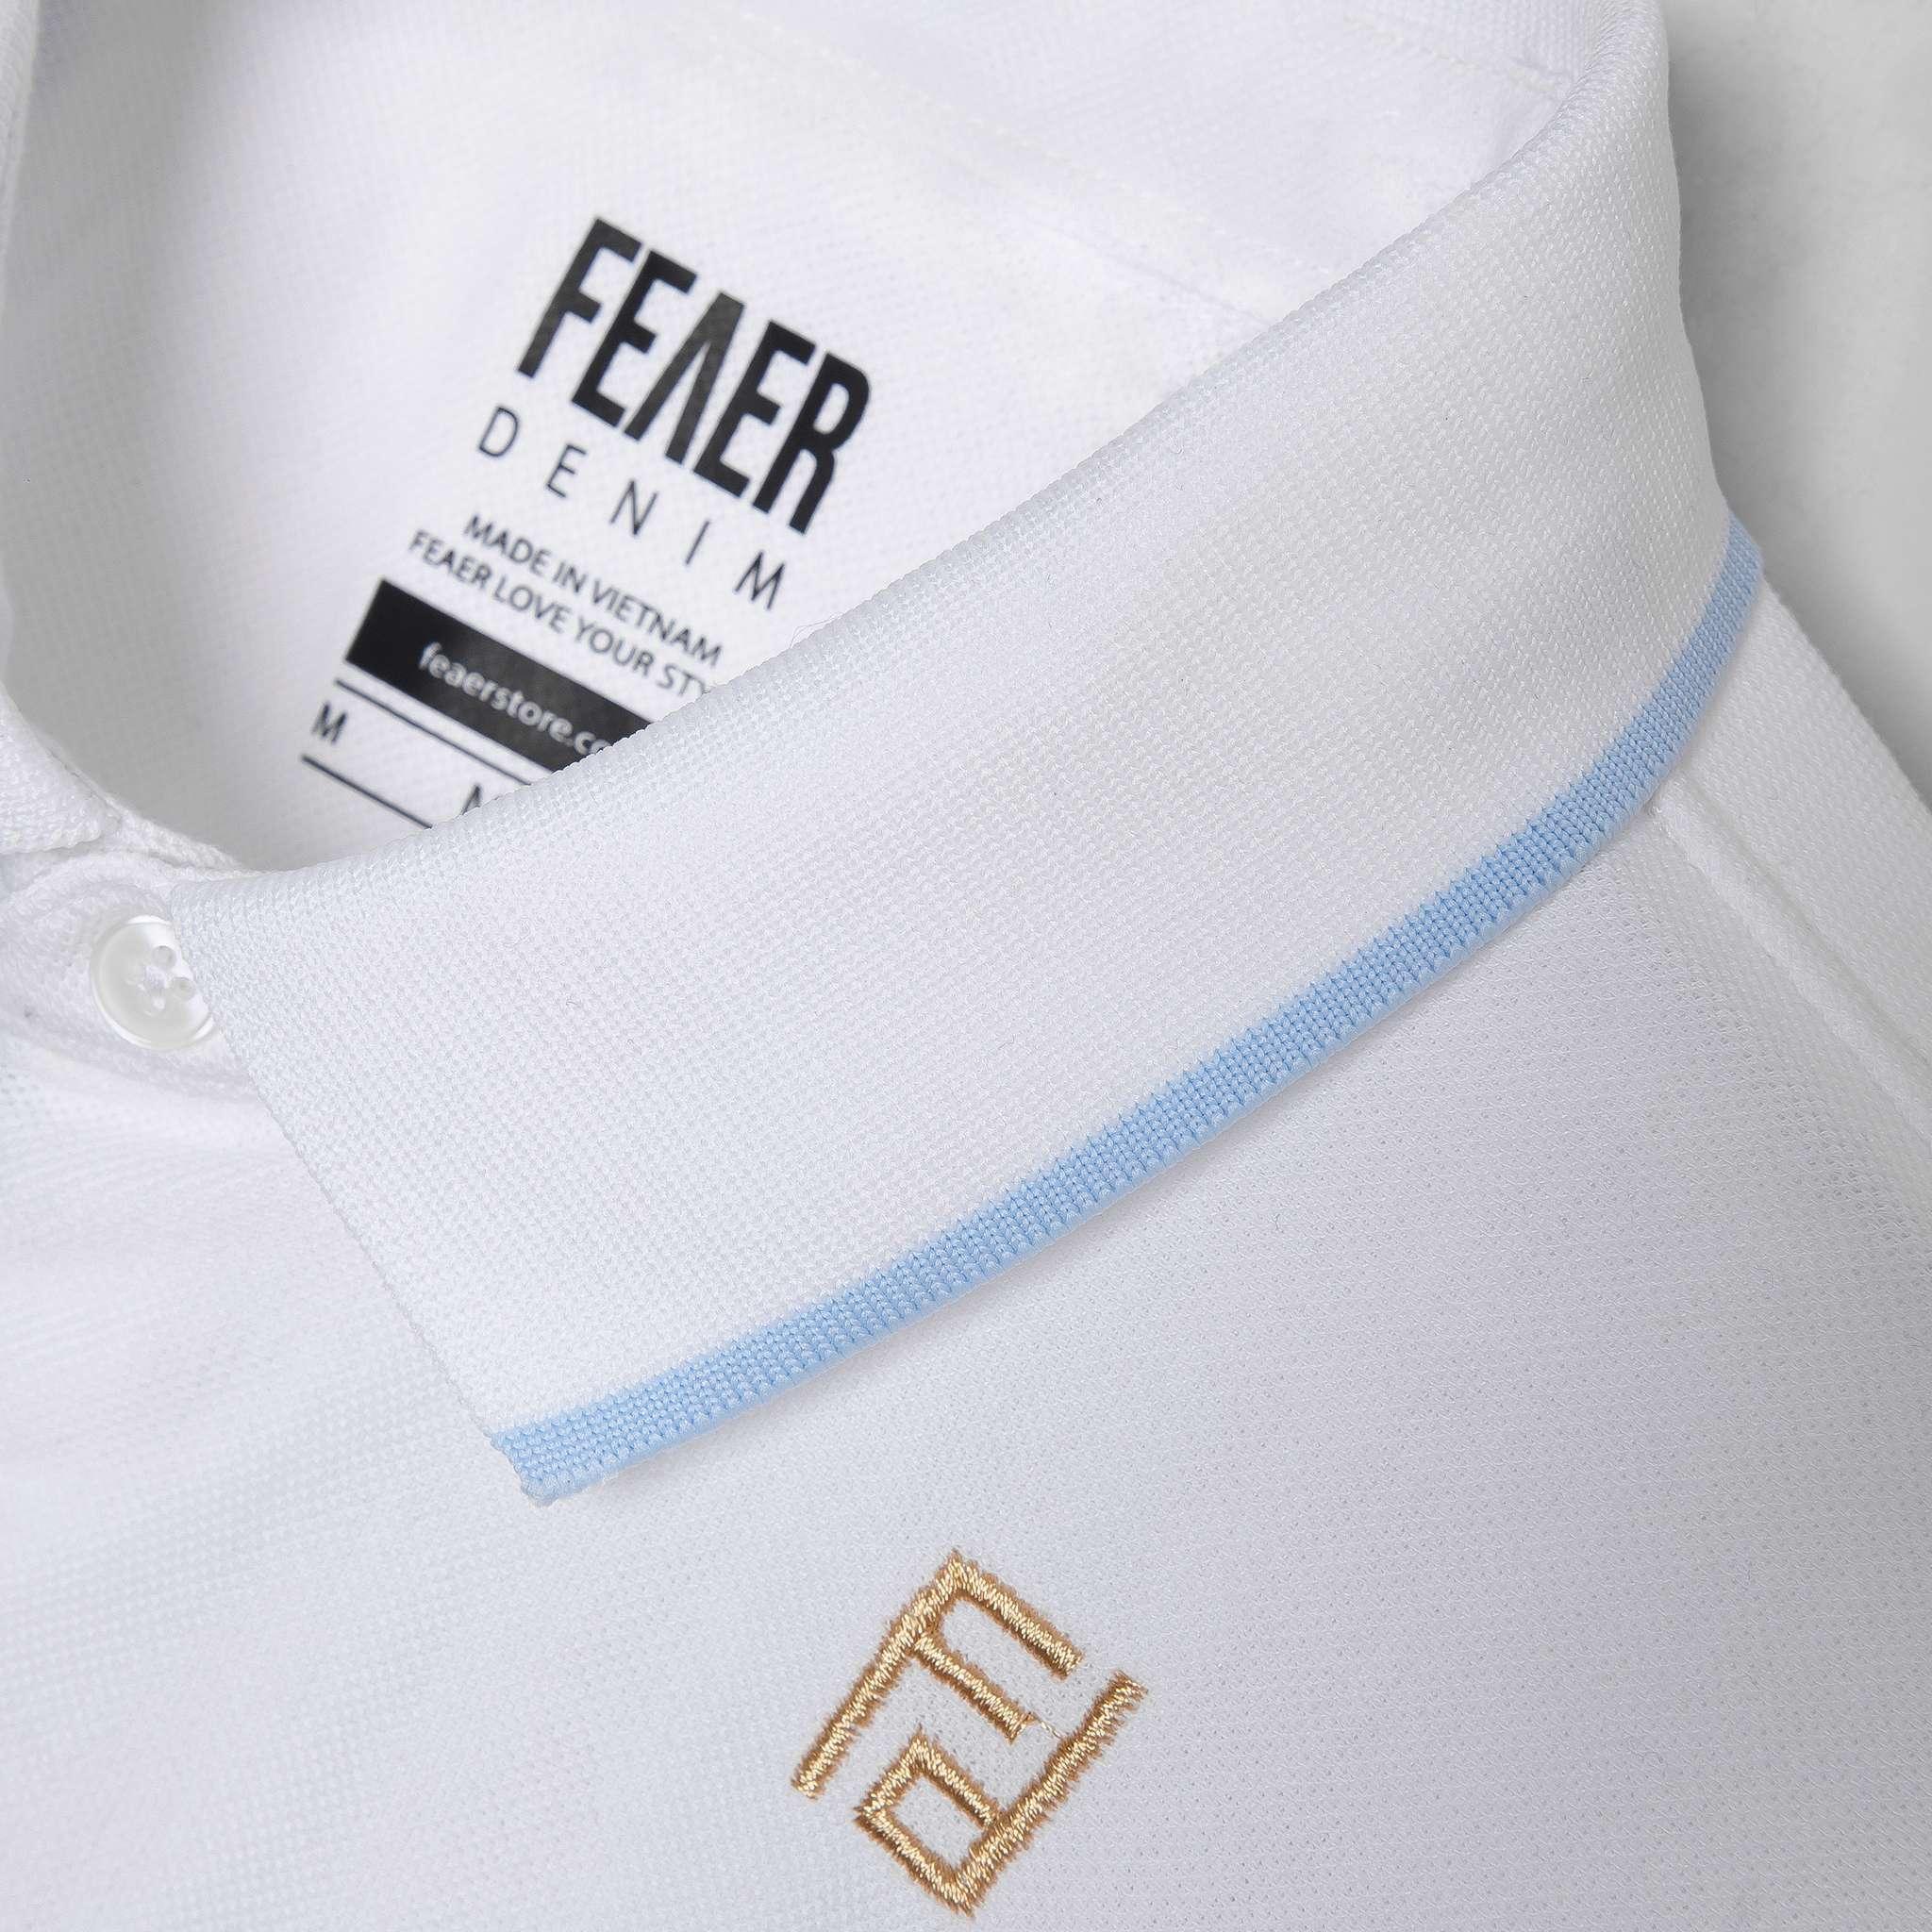 SP255 - Áo Polo Pattern Feaer